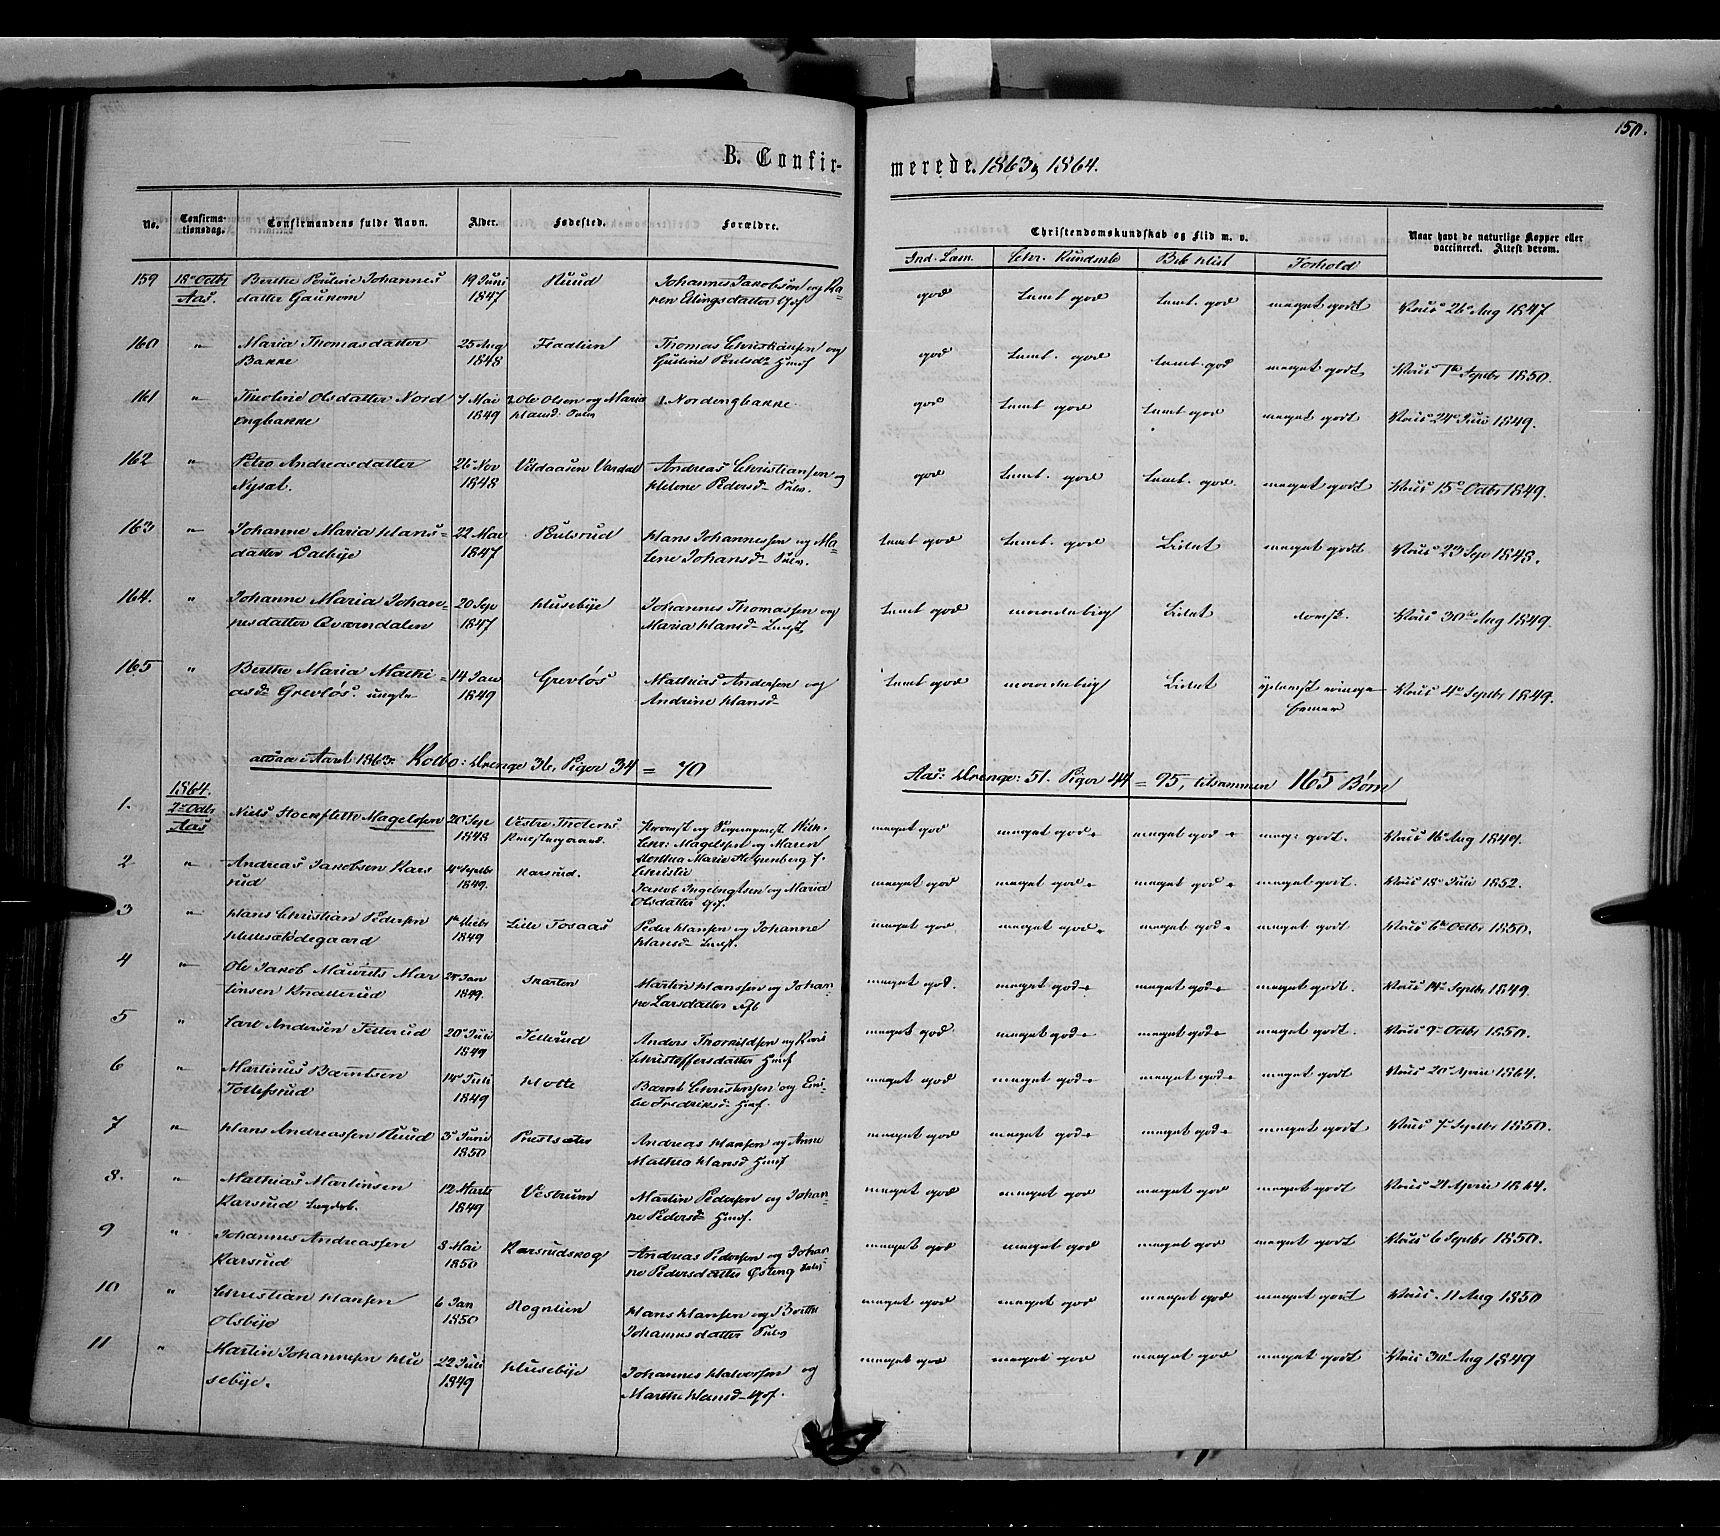 SAH, Vestre Toten prestekontor, H/Ha/Haa/L0007: Ministerialbok nr. 7, 1862-1869, s. 150